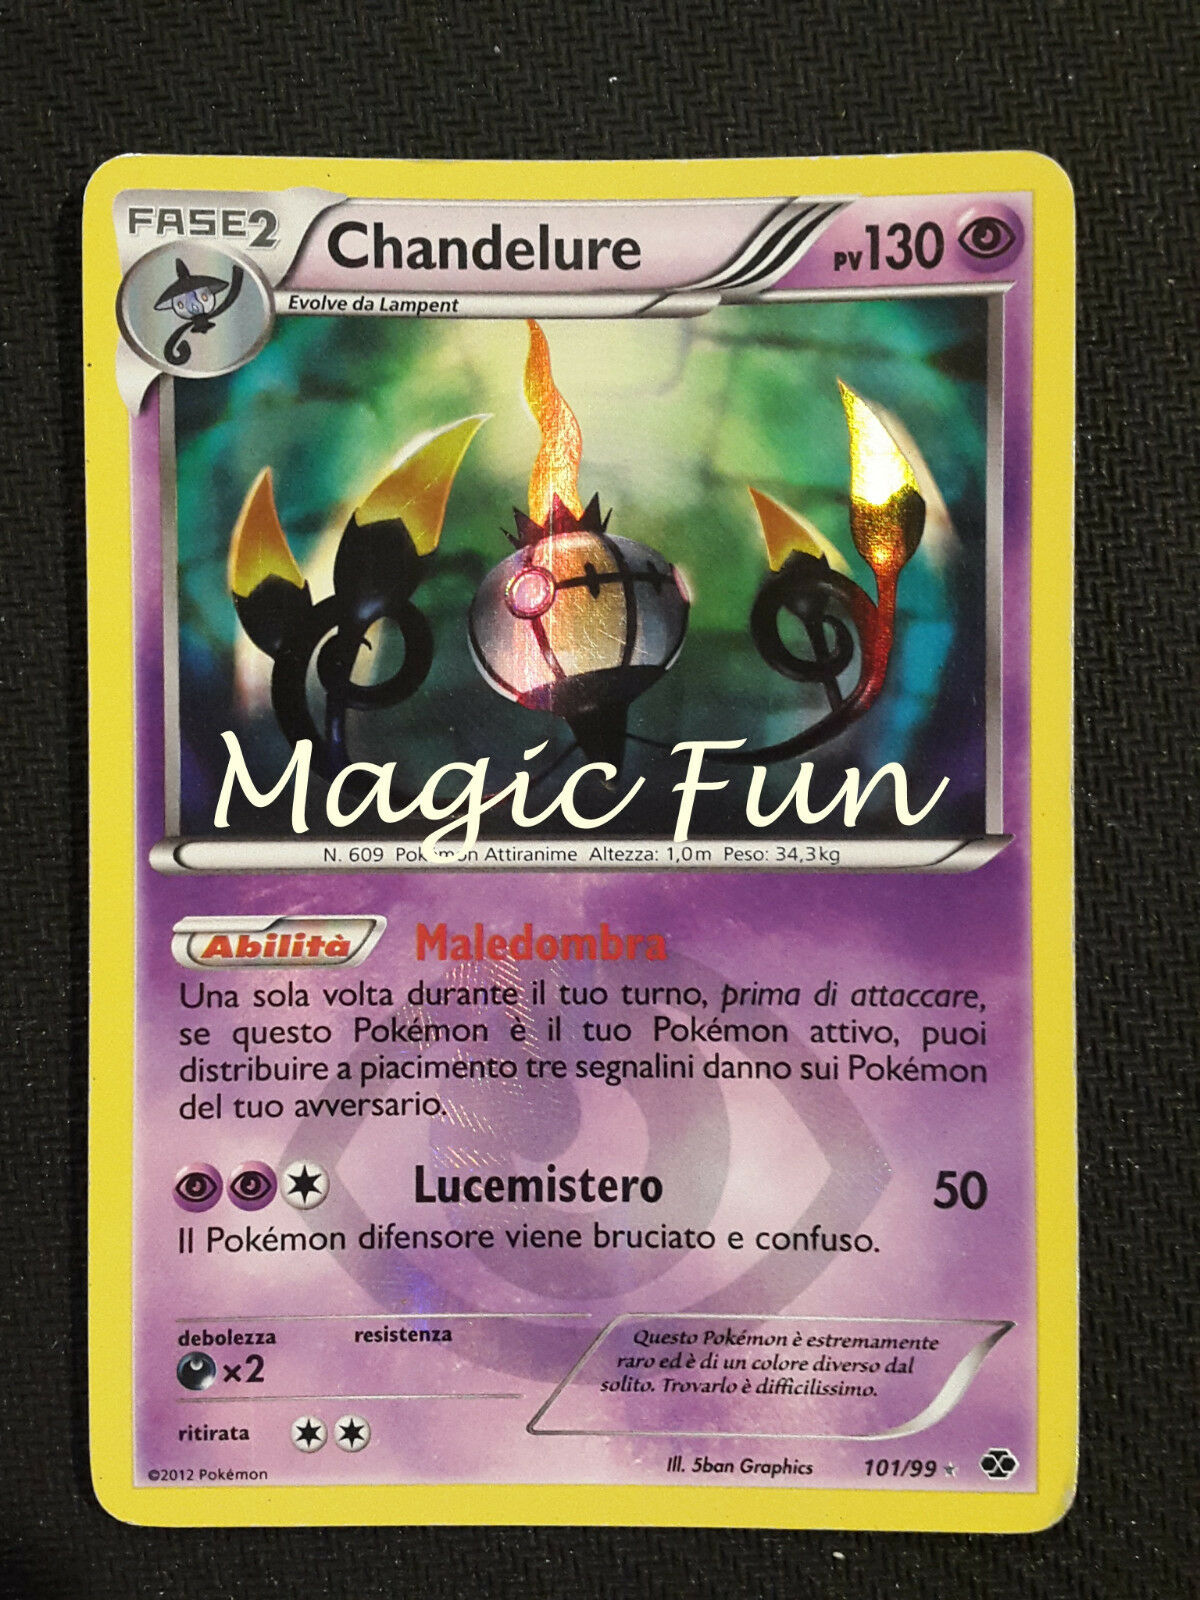 Chandelure pv130 101 101 101   99 fuori serie - destini futuri (mf) 6b4352